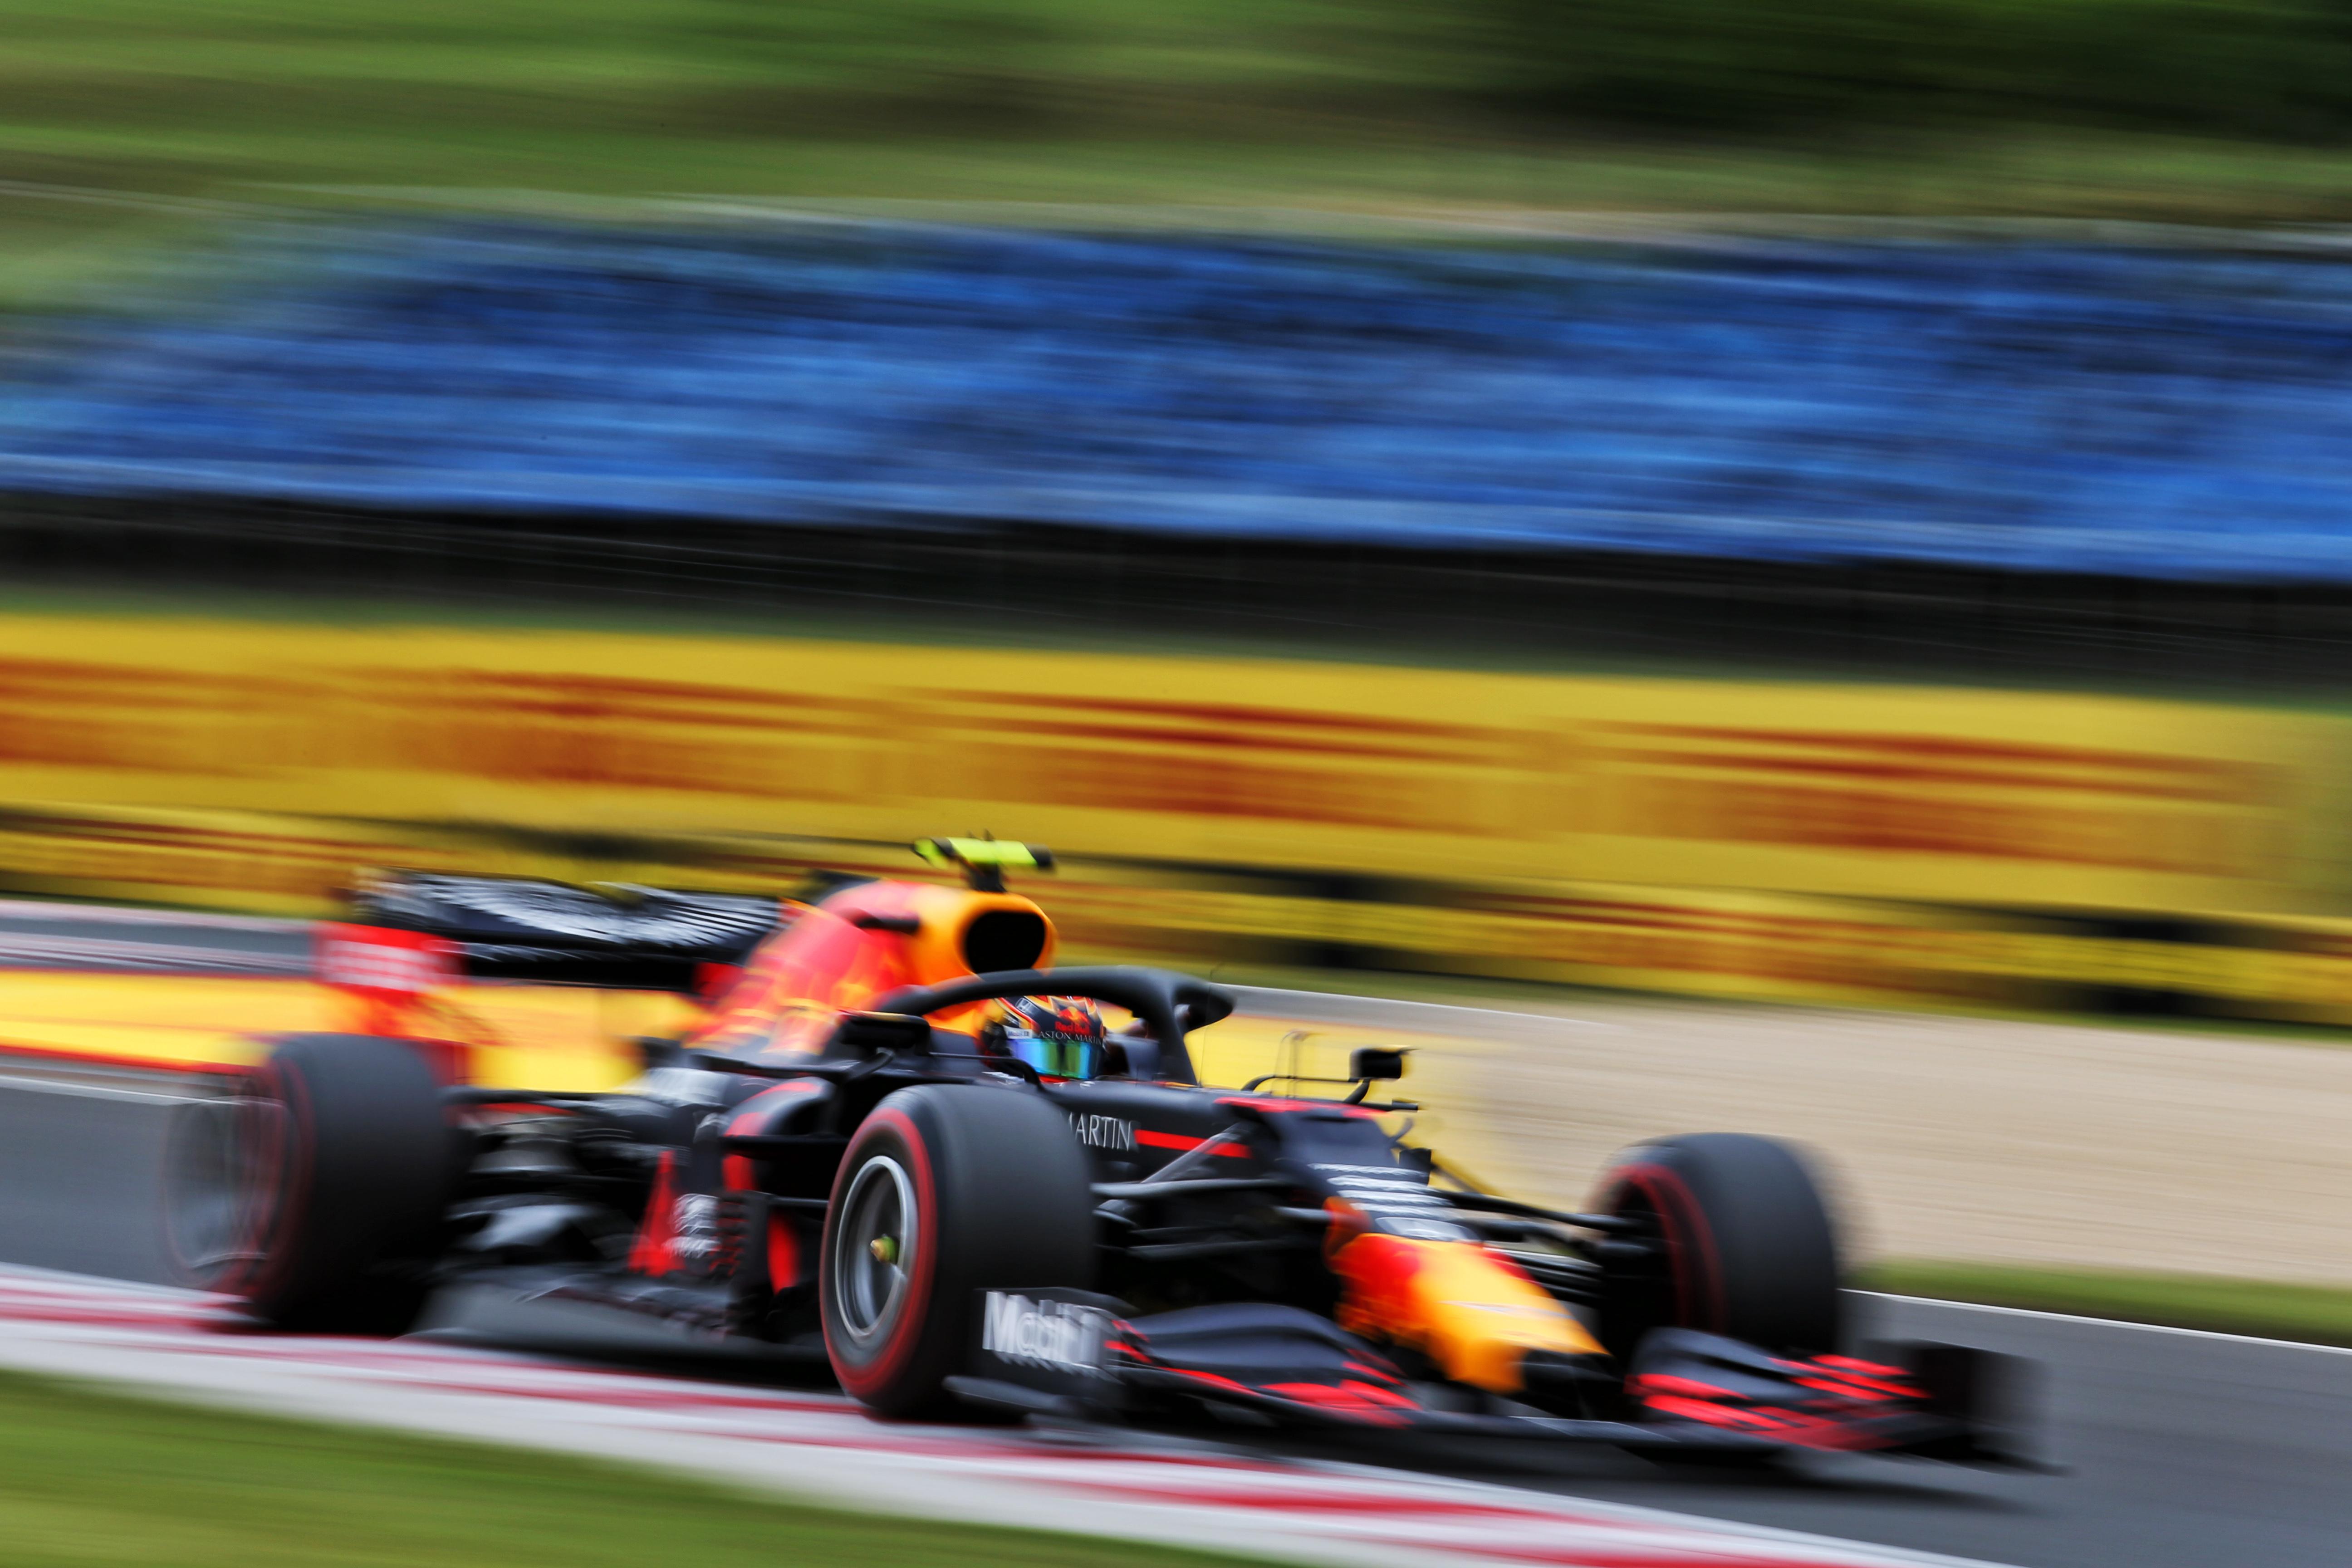 Alex Albon Red Bull F1 Hungary 2020